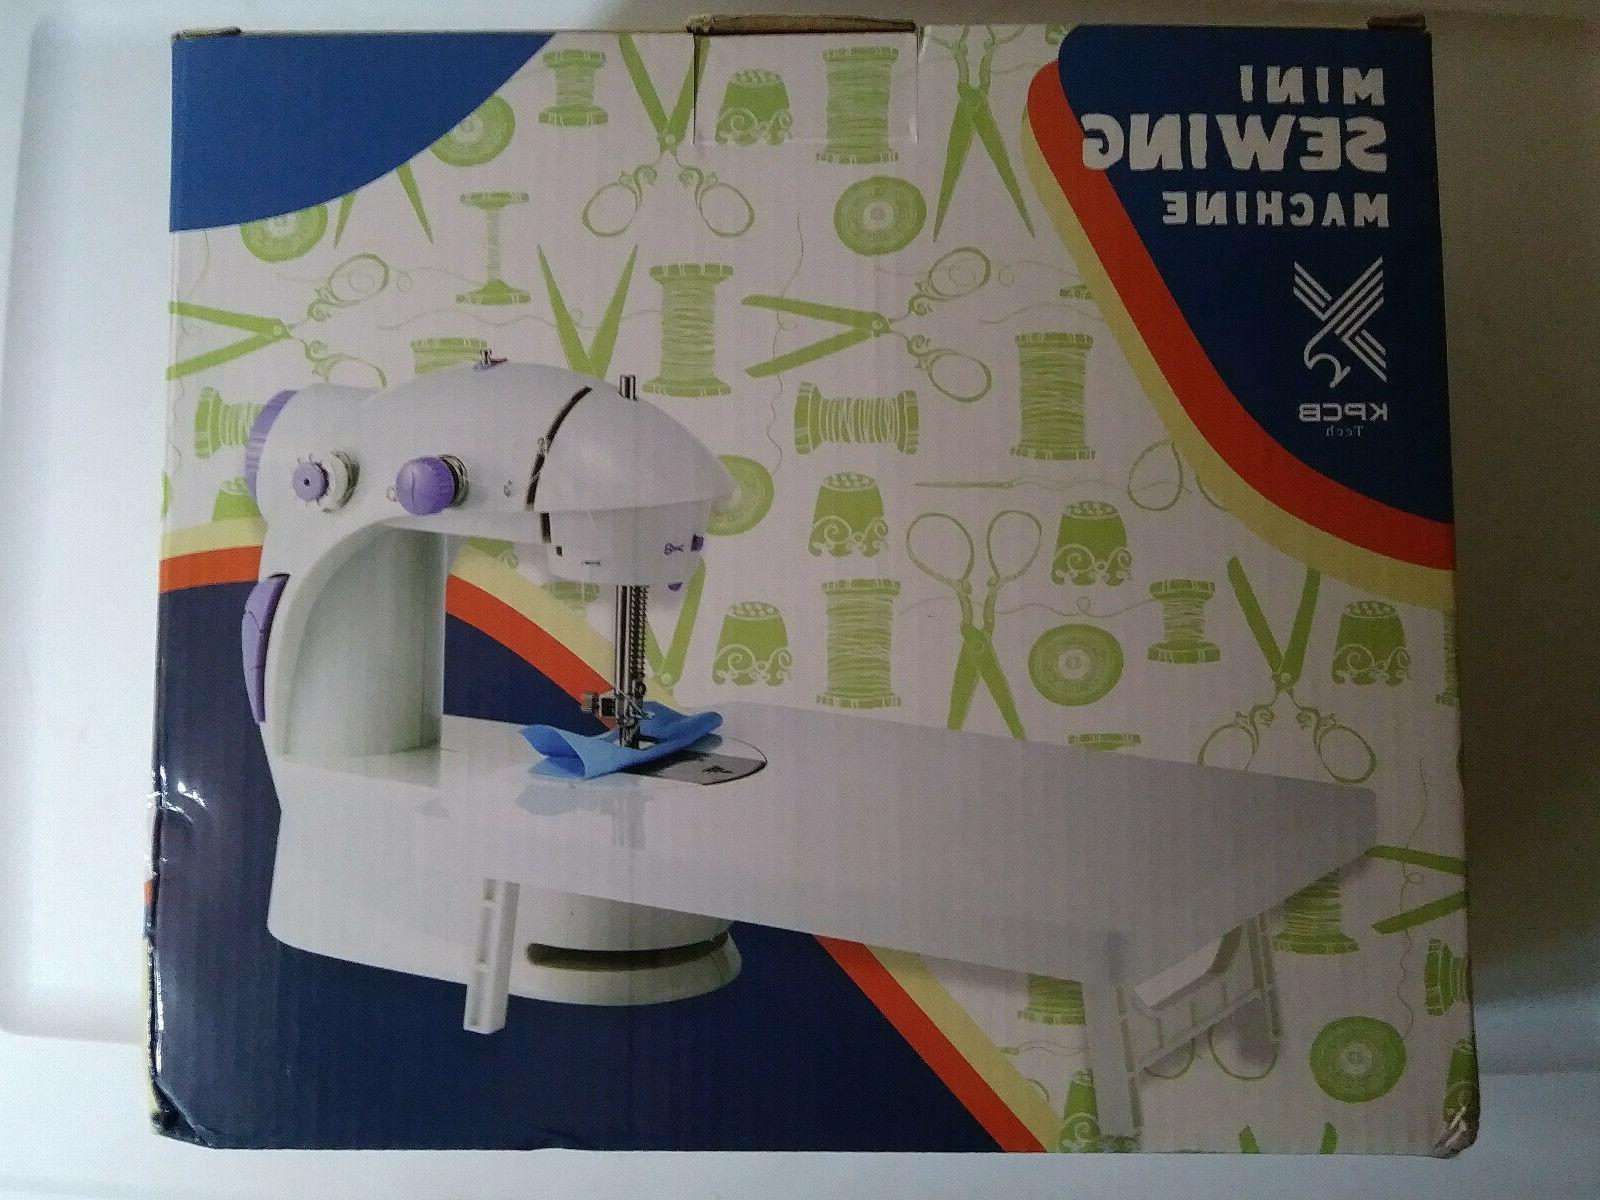 kpcb mini sewing machine with upgraded eco